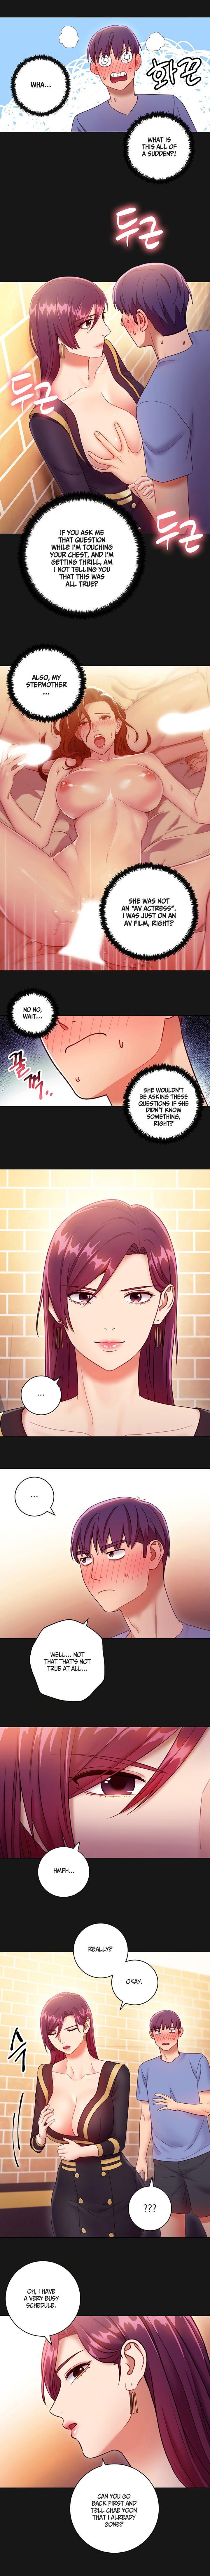 [Neck Pilllow] Stepmother Friends Ch.40/? [English] [Hentai Universe] NEW! 22/10/2020 343